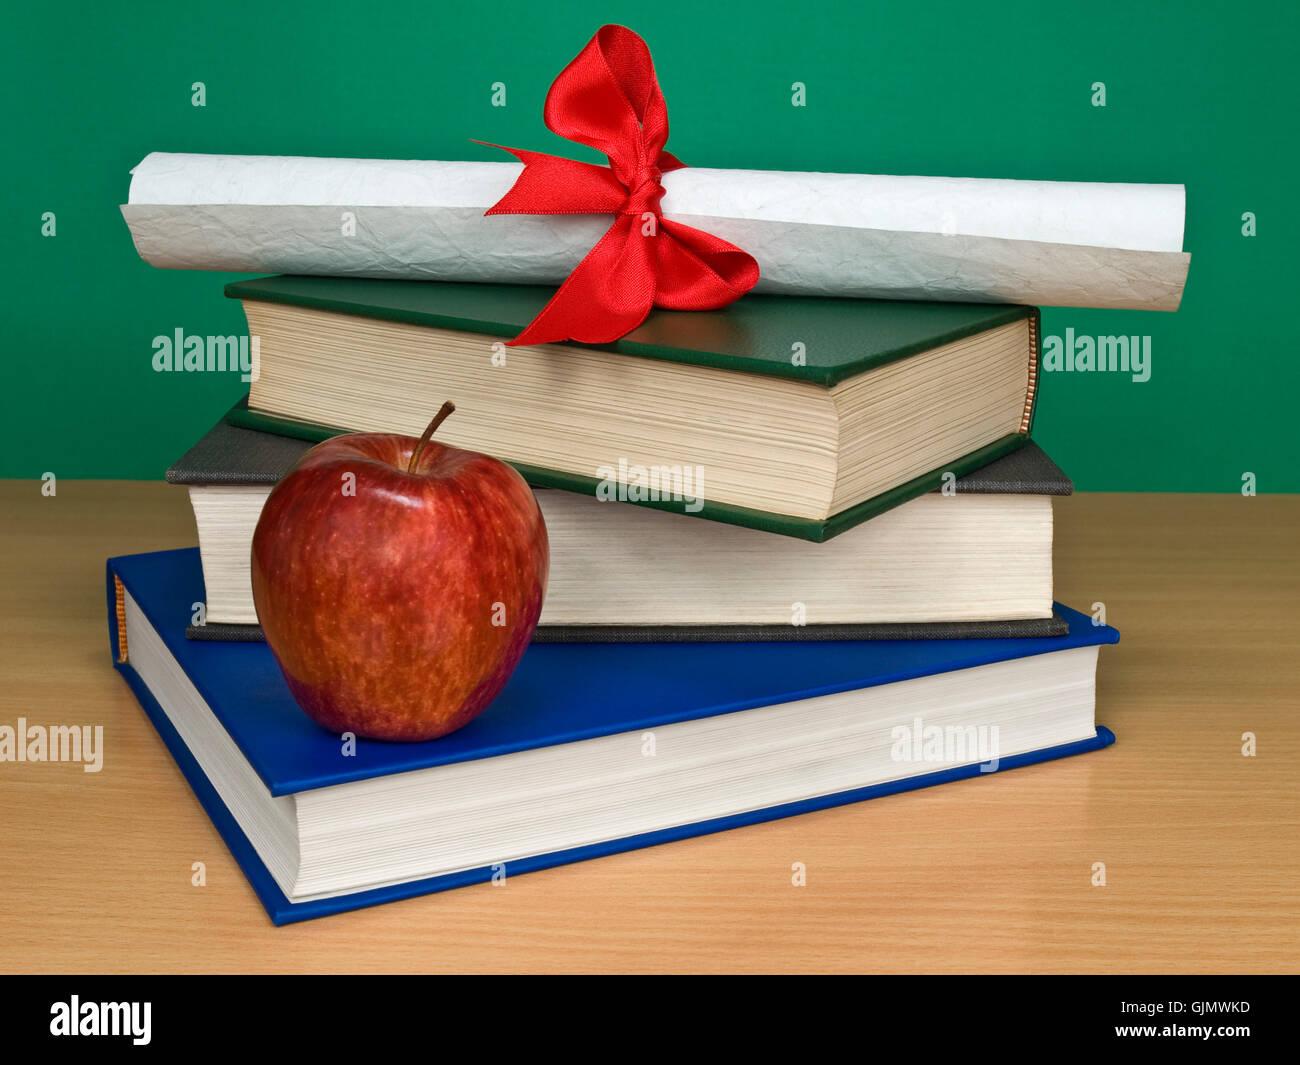 education green diploma - Stock Image